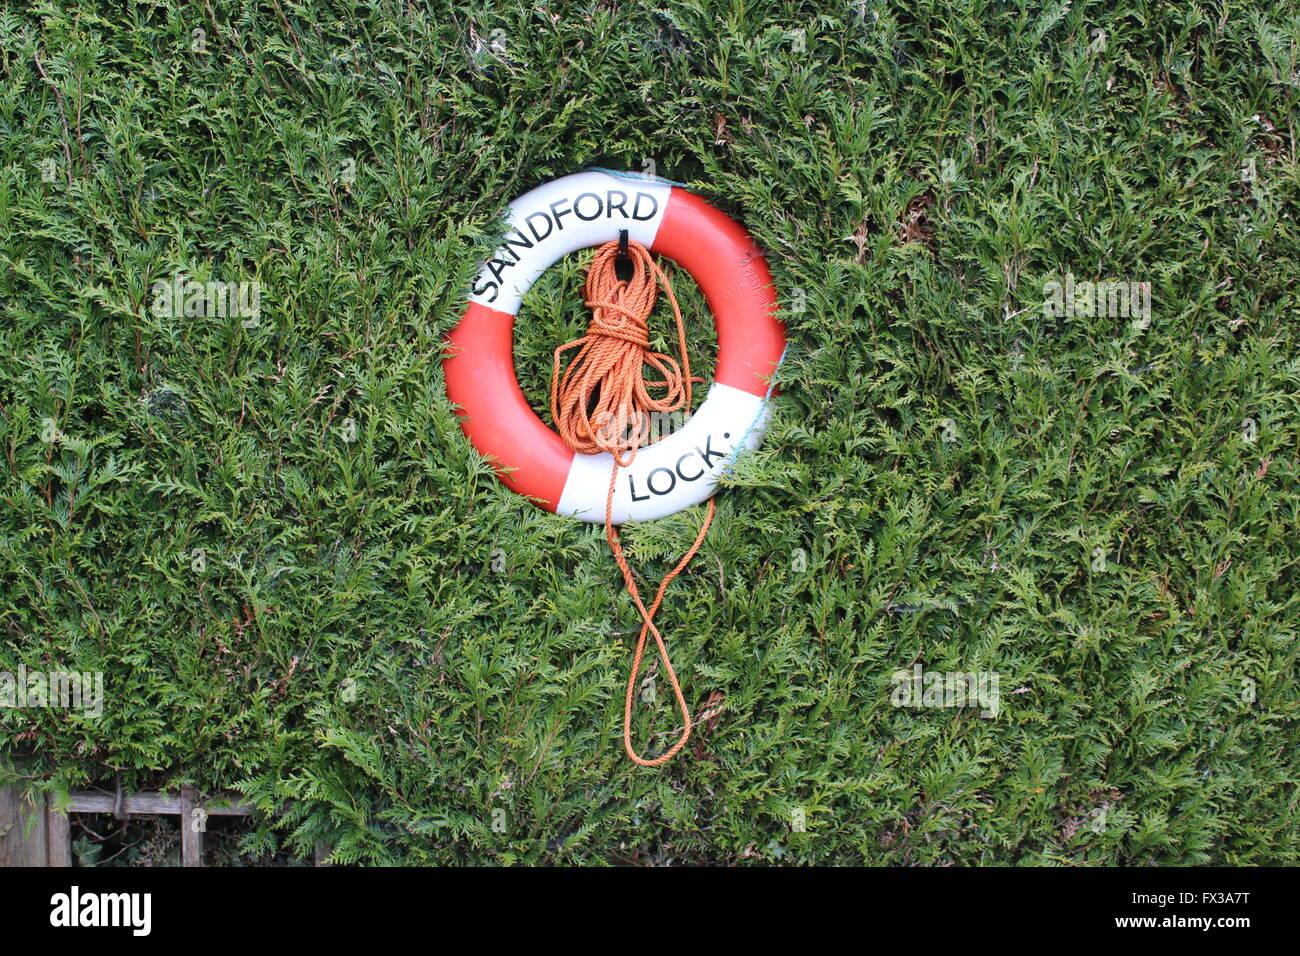 Life Belt nestled in bush by Sandford Lock on the River Thames, Sandford, Oxfordshire, UK - Stock Image